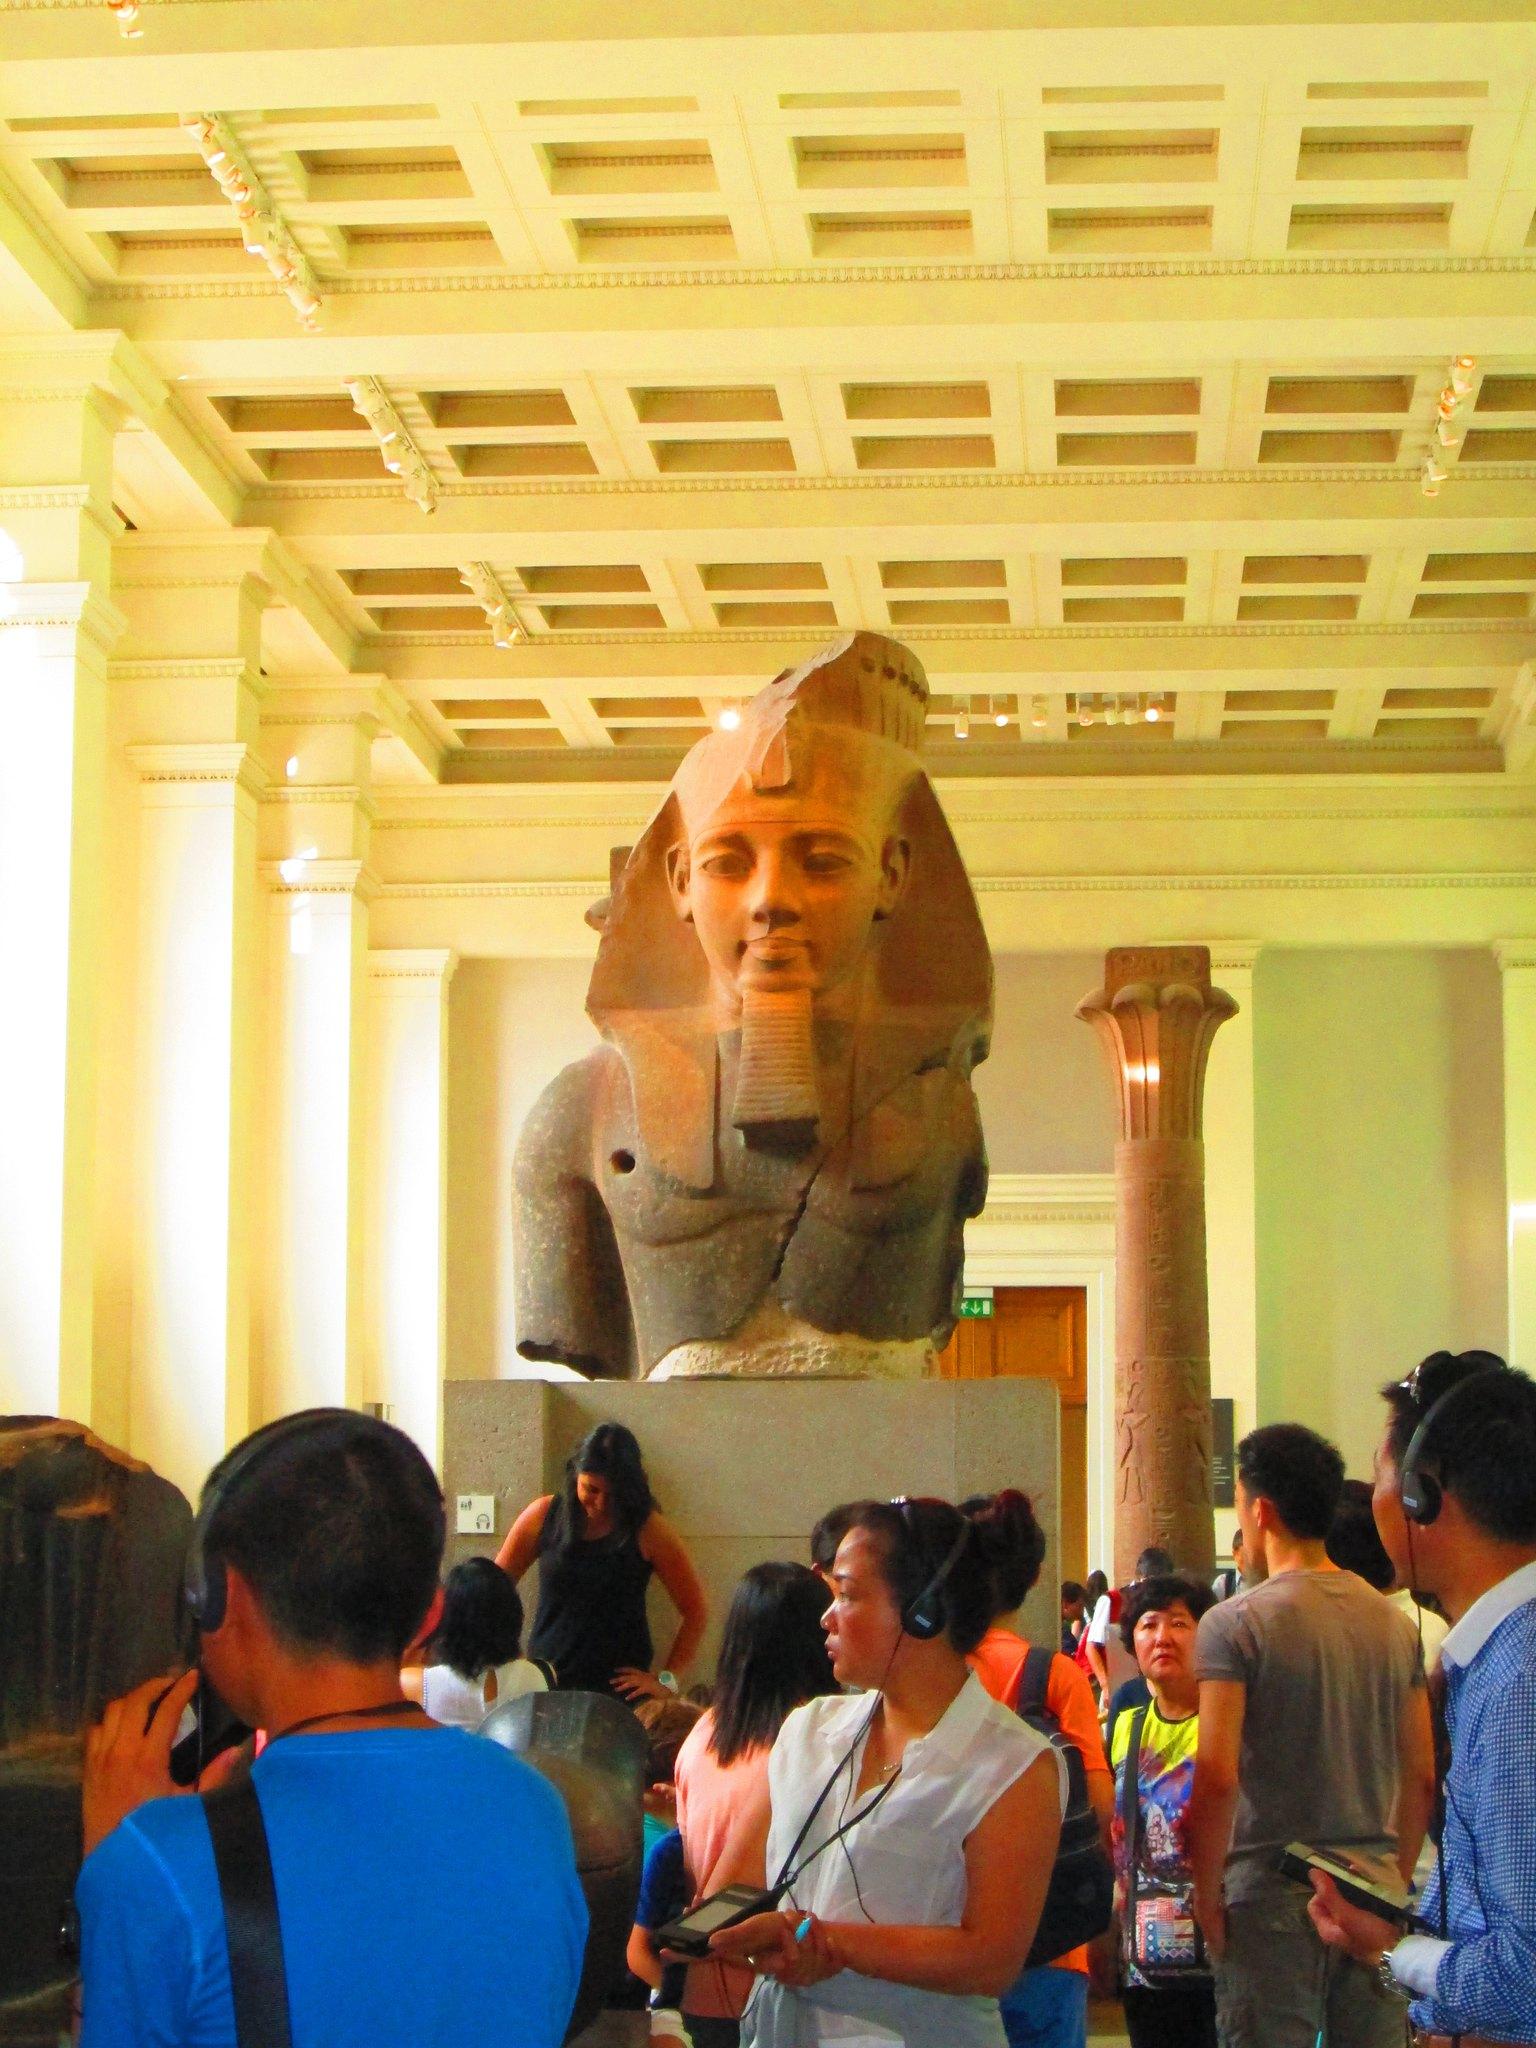 British Museum Amenhotep III Statue